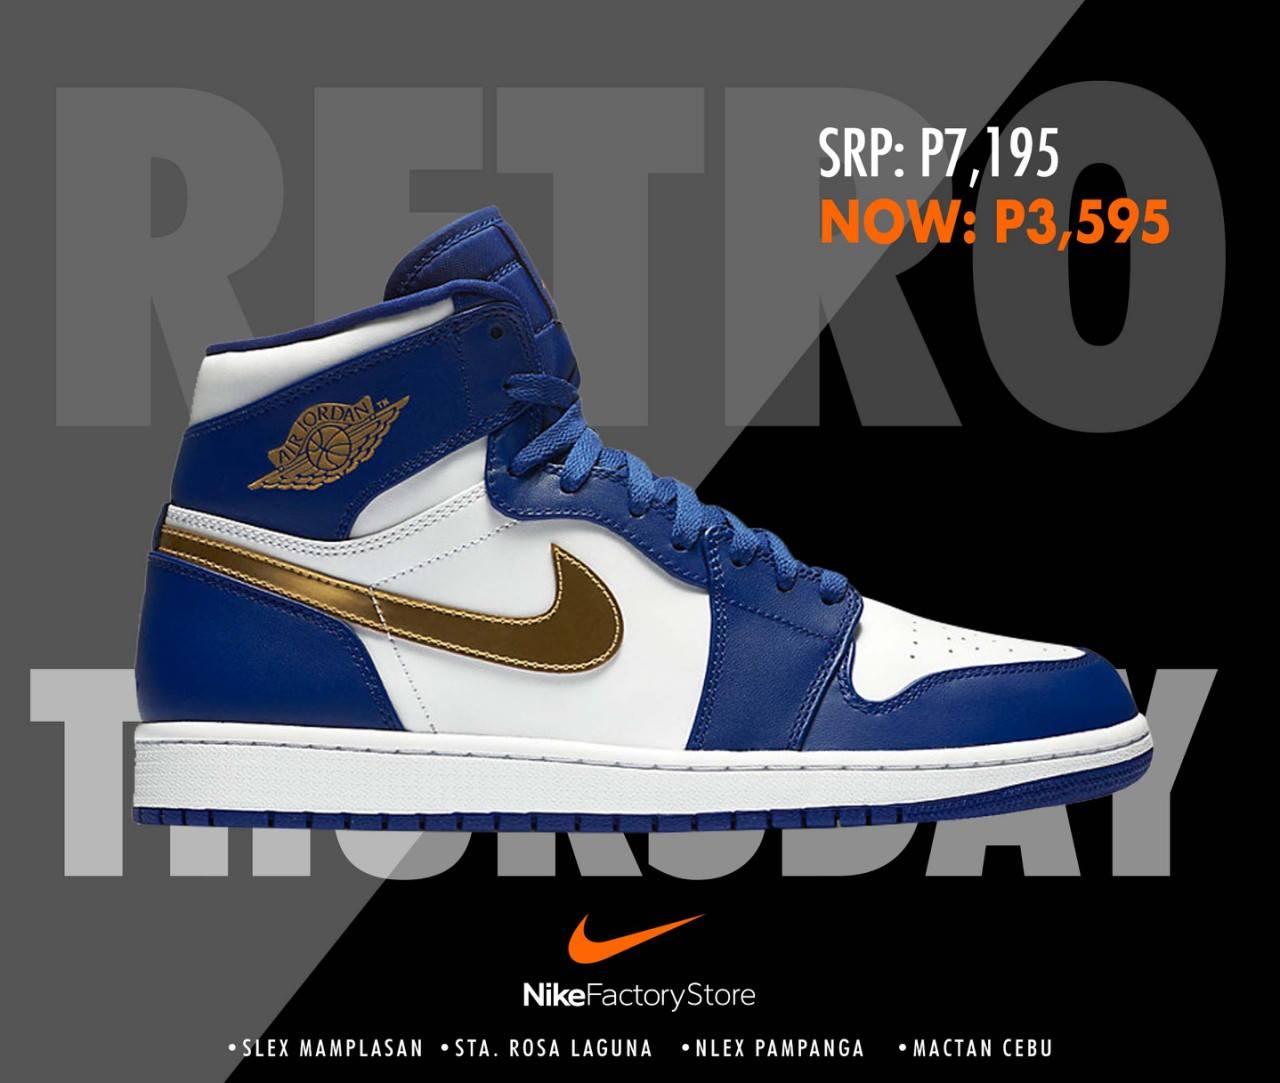 Nike Factory Store 50% OFF JORDANS!!!